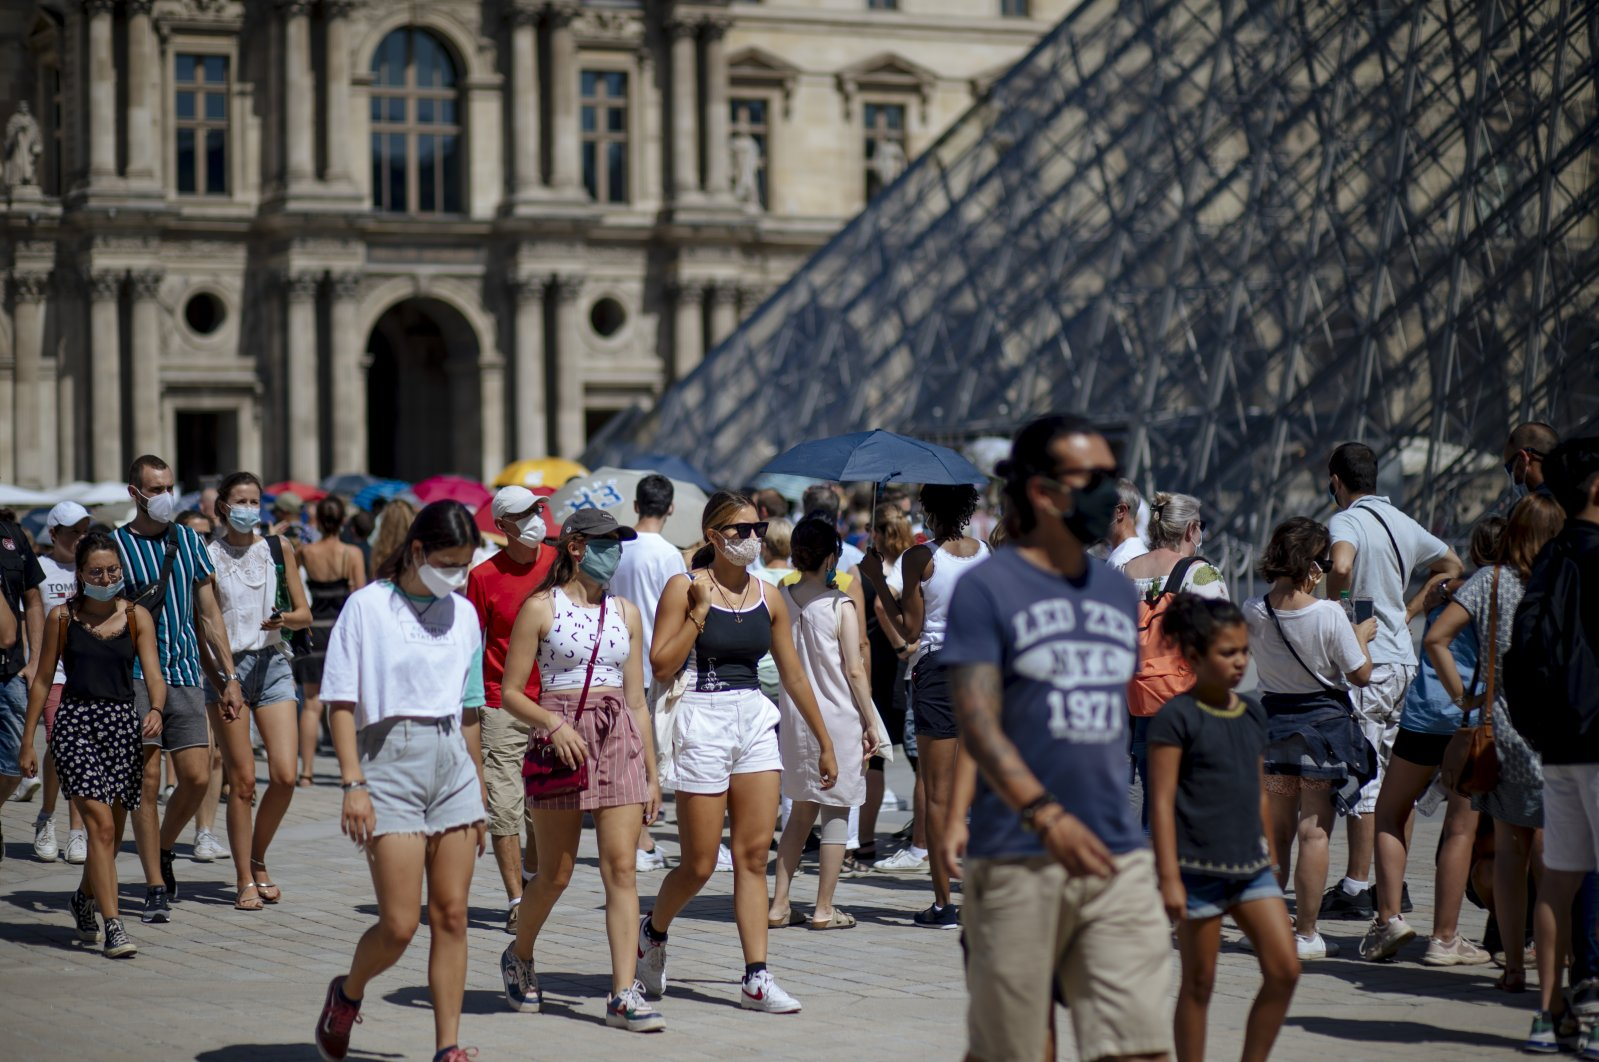 People walk past the Louvre Museum in Paris, France, Aug. 12, 2020. (AP Photo)